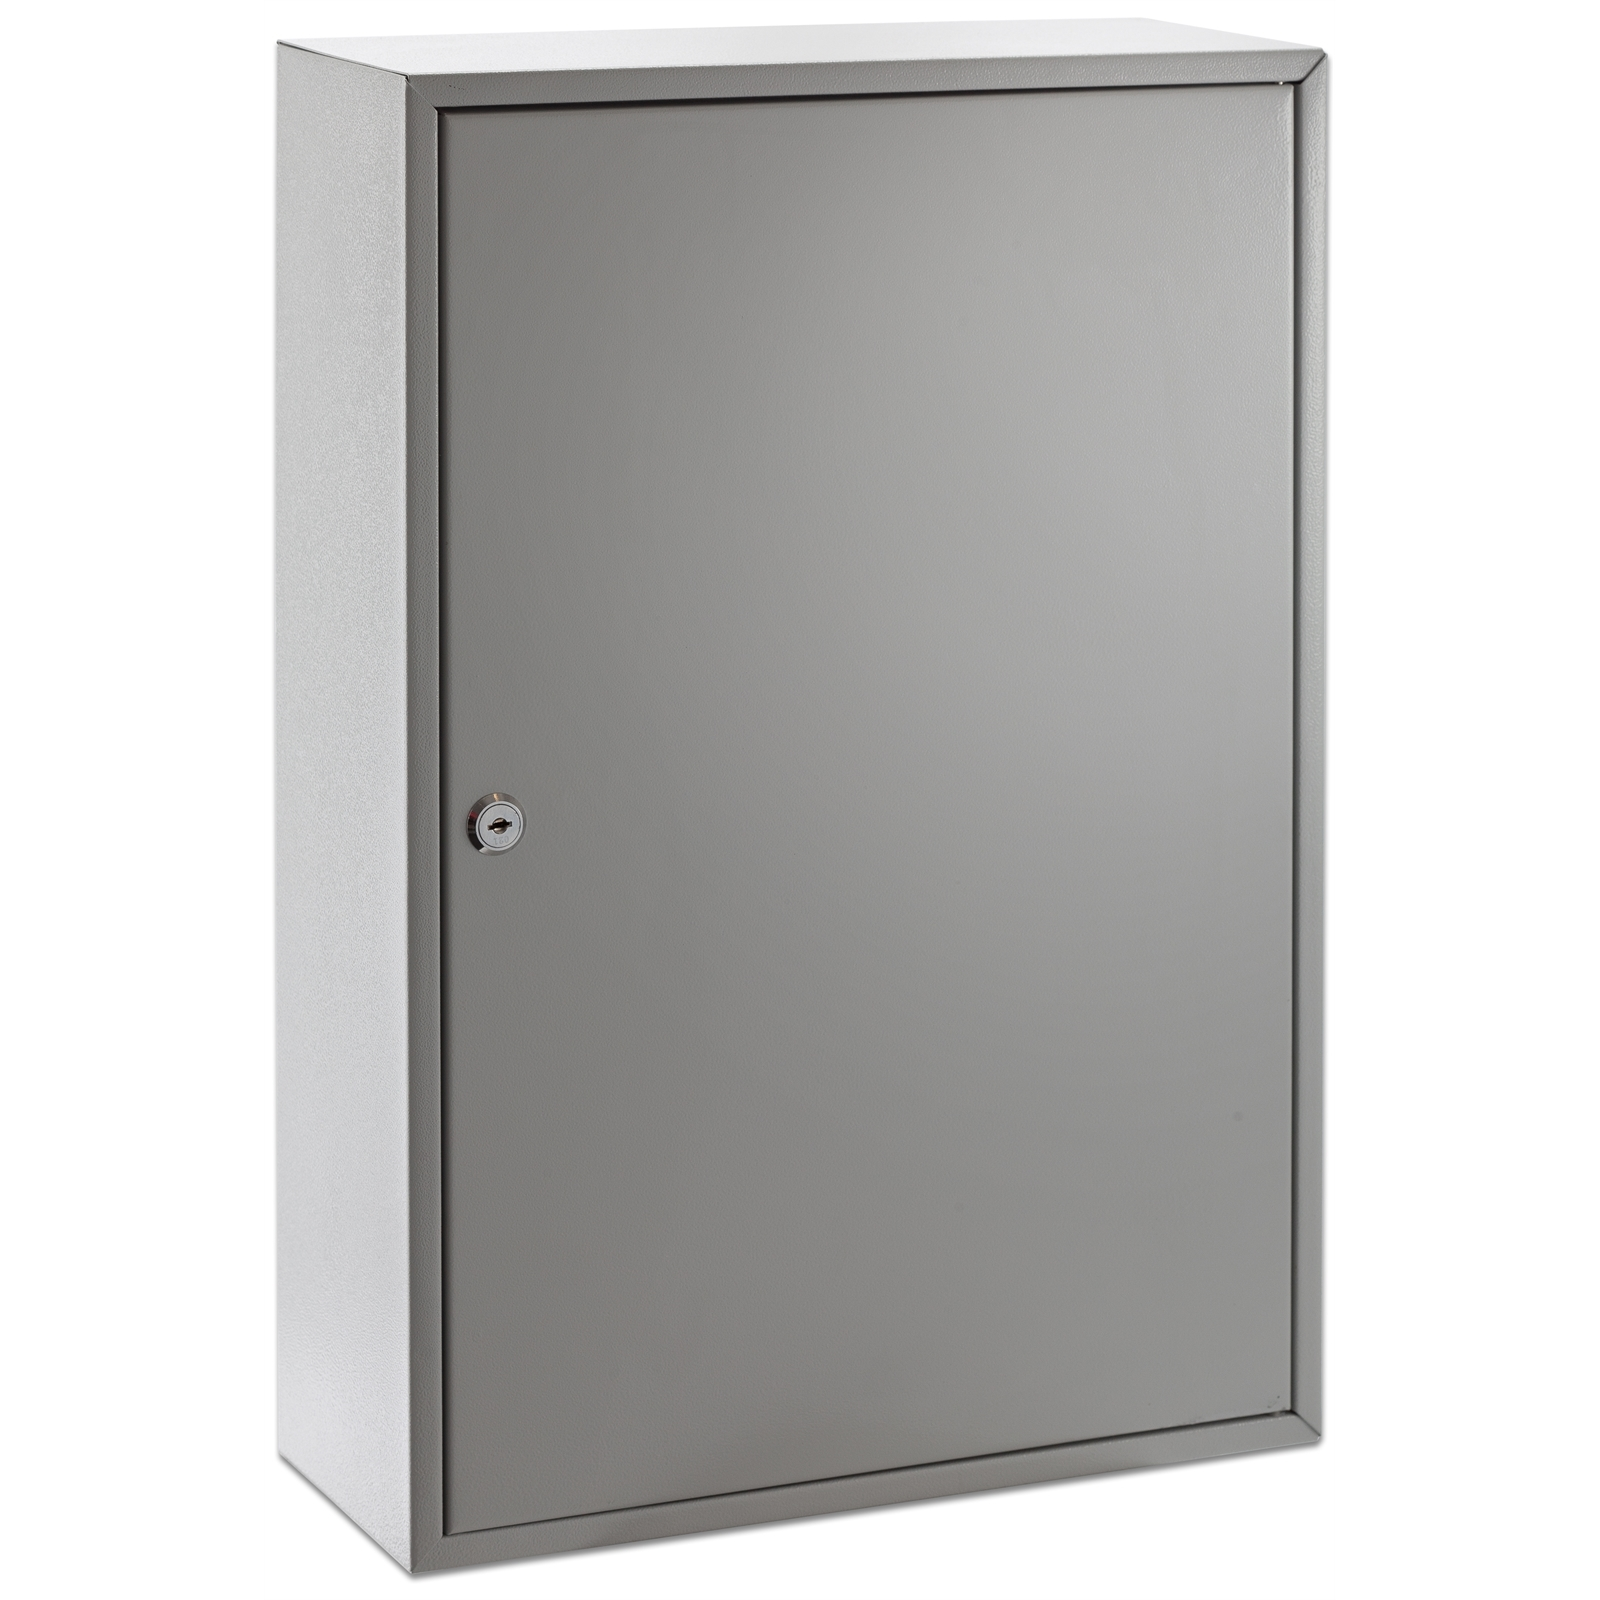 Sandleford 550 x 380 x 140mm 200 Key Cabinet